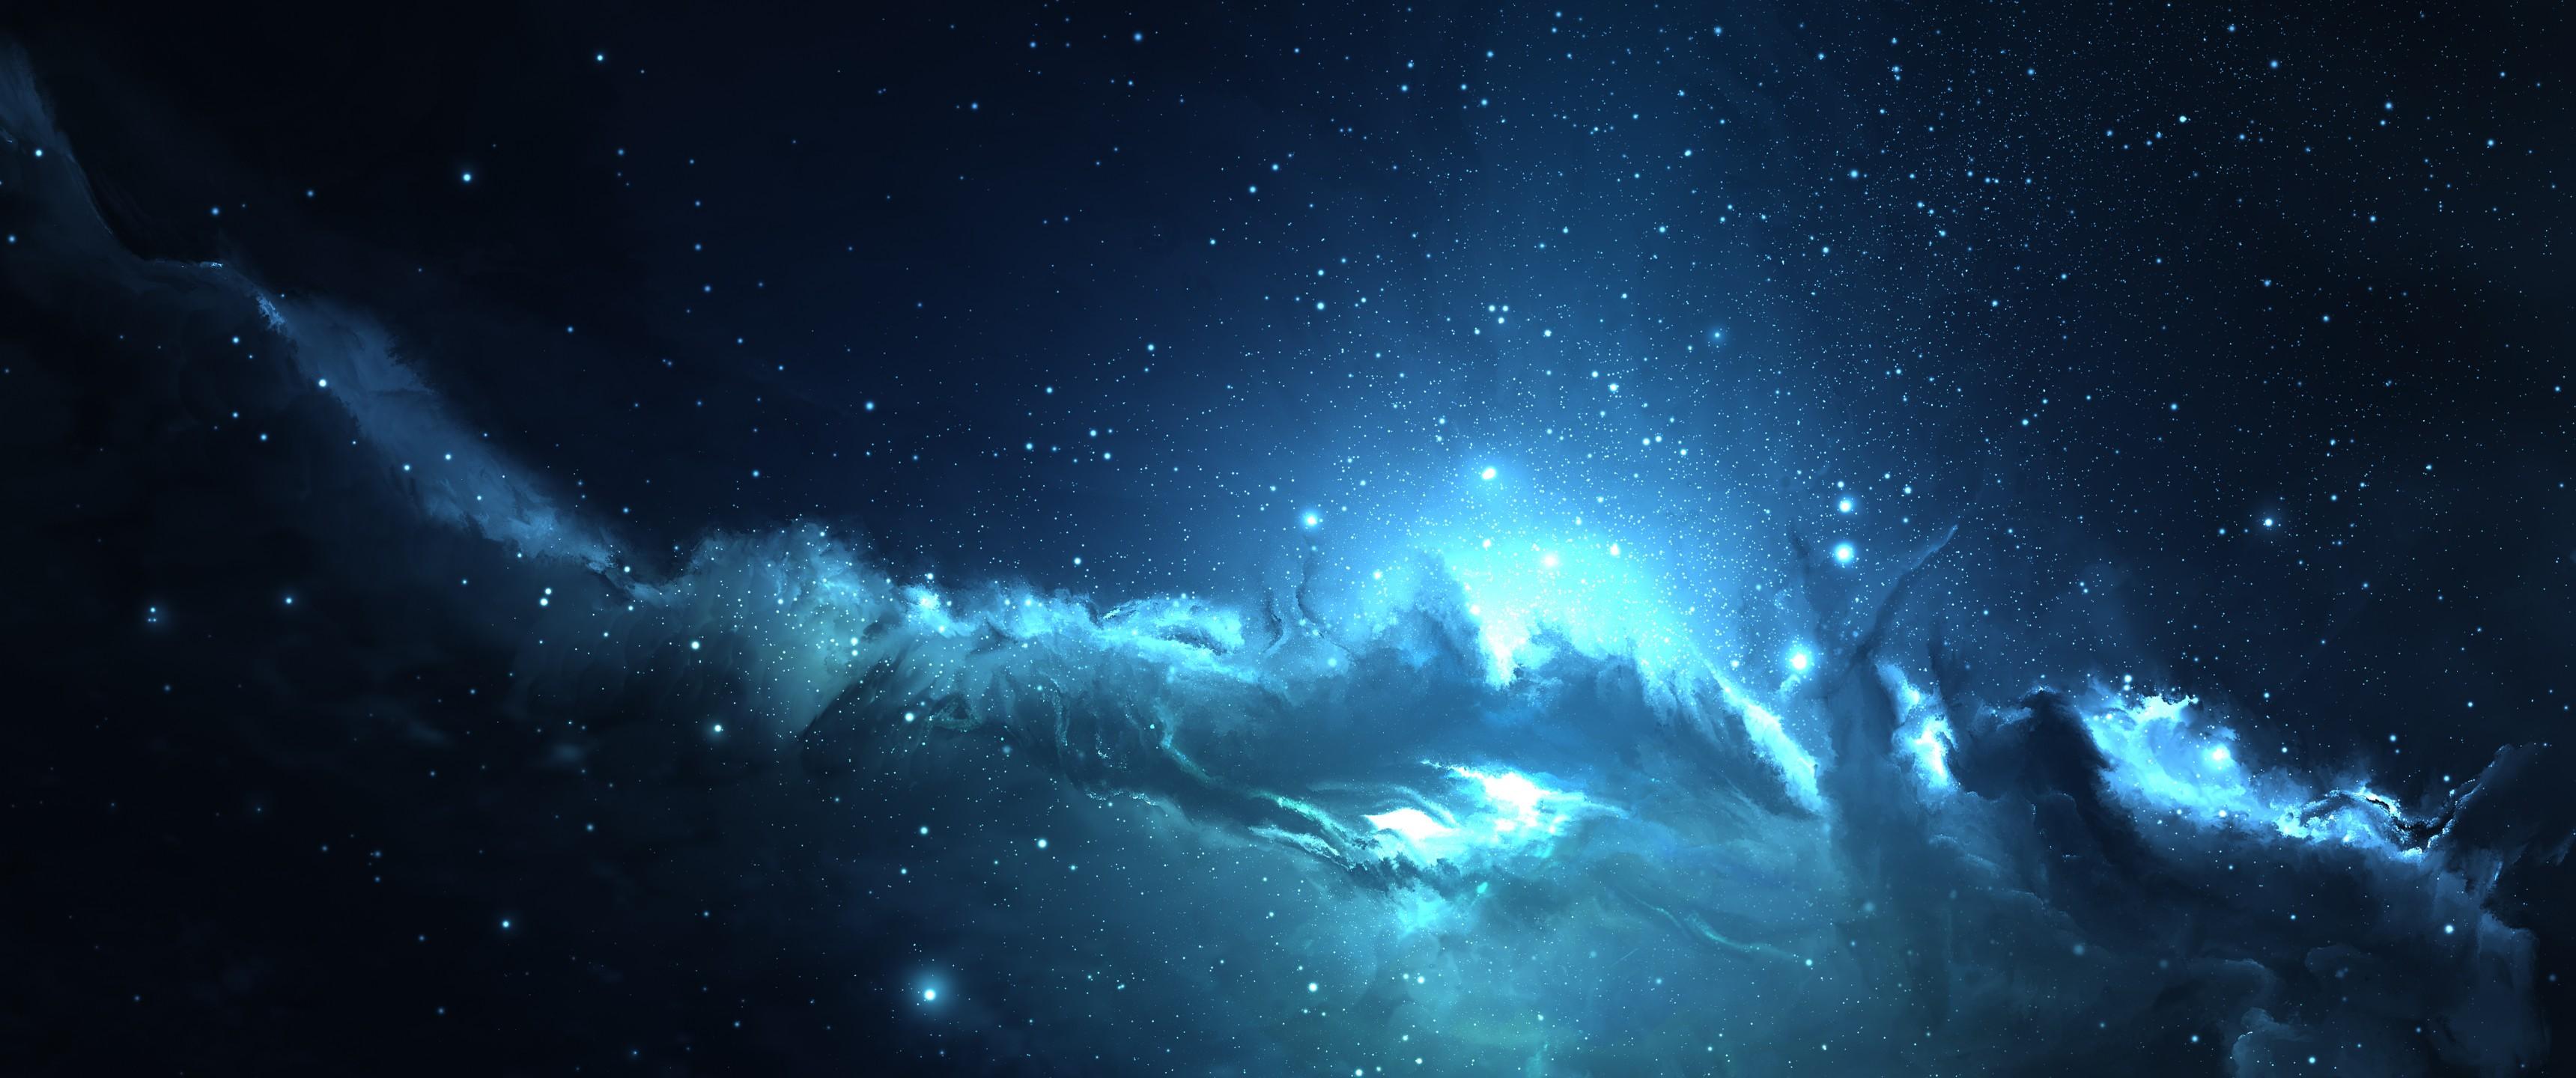 Ultra wide wallpaper download free beautiful full hd - Blue space hd ...